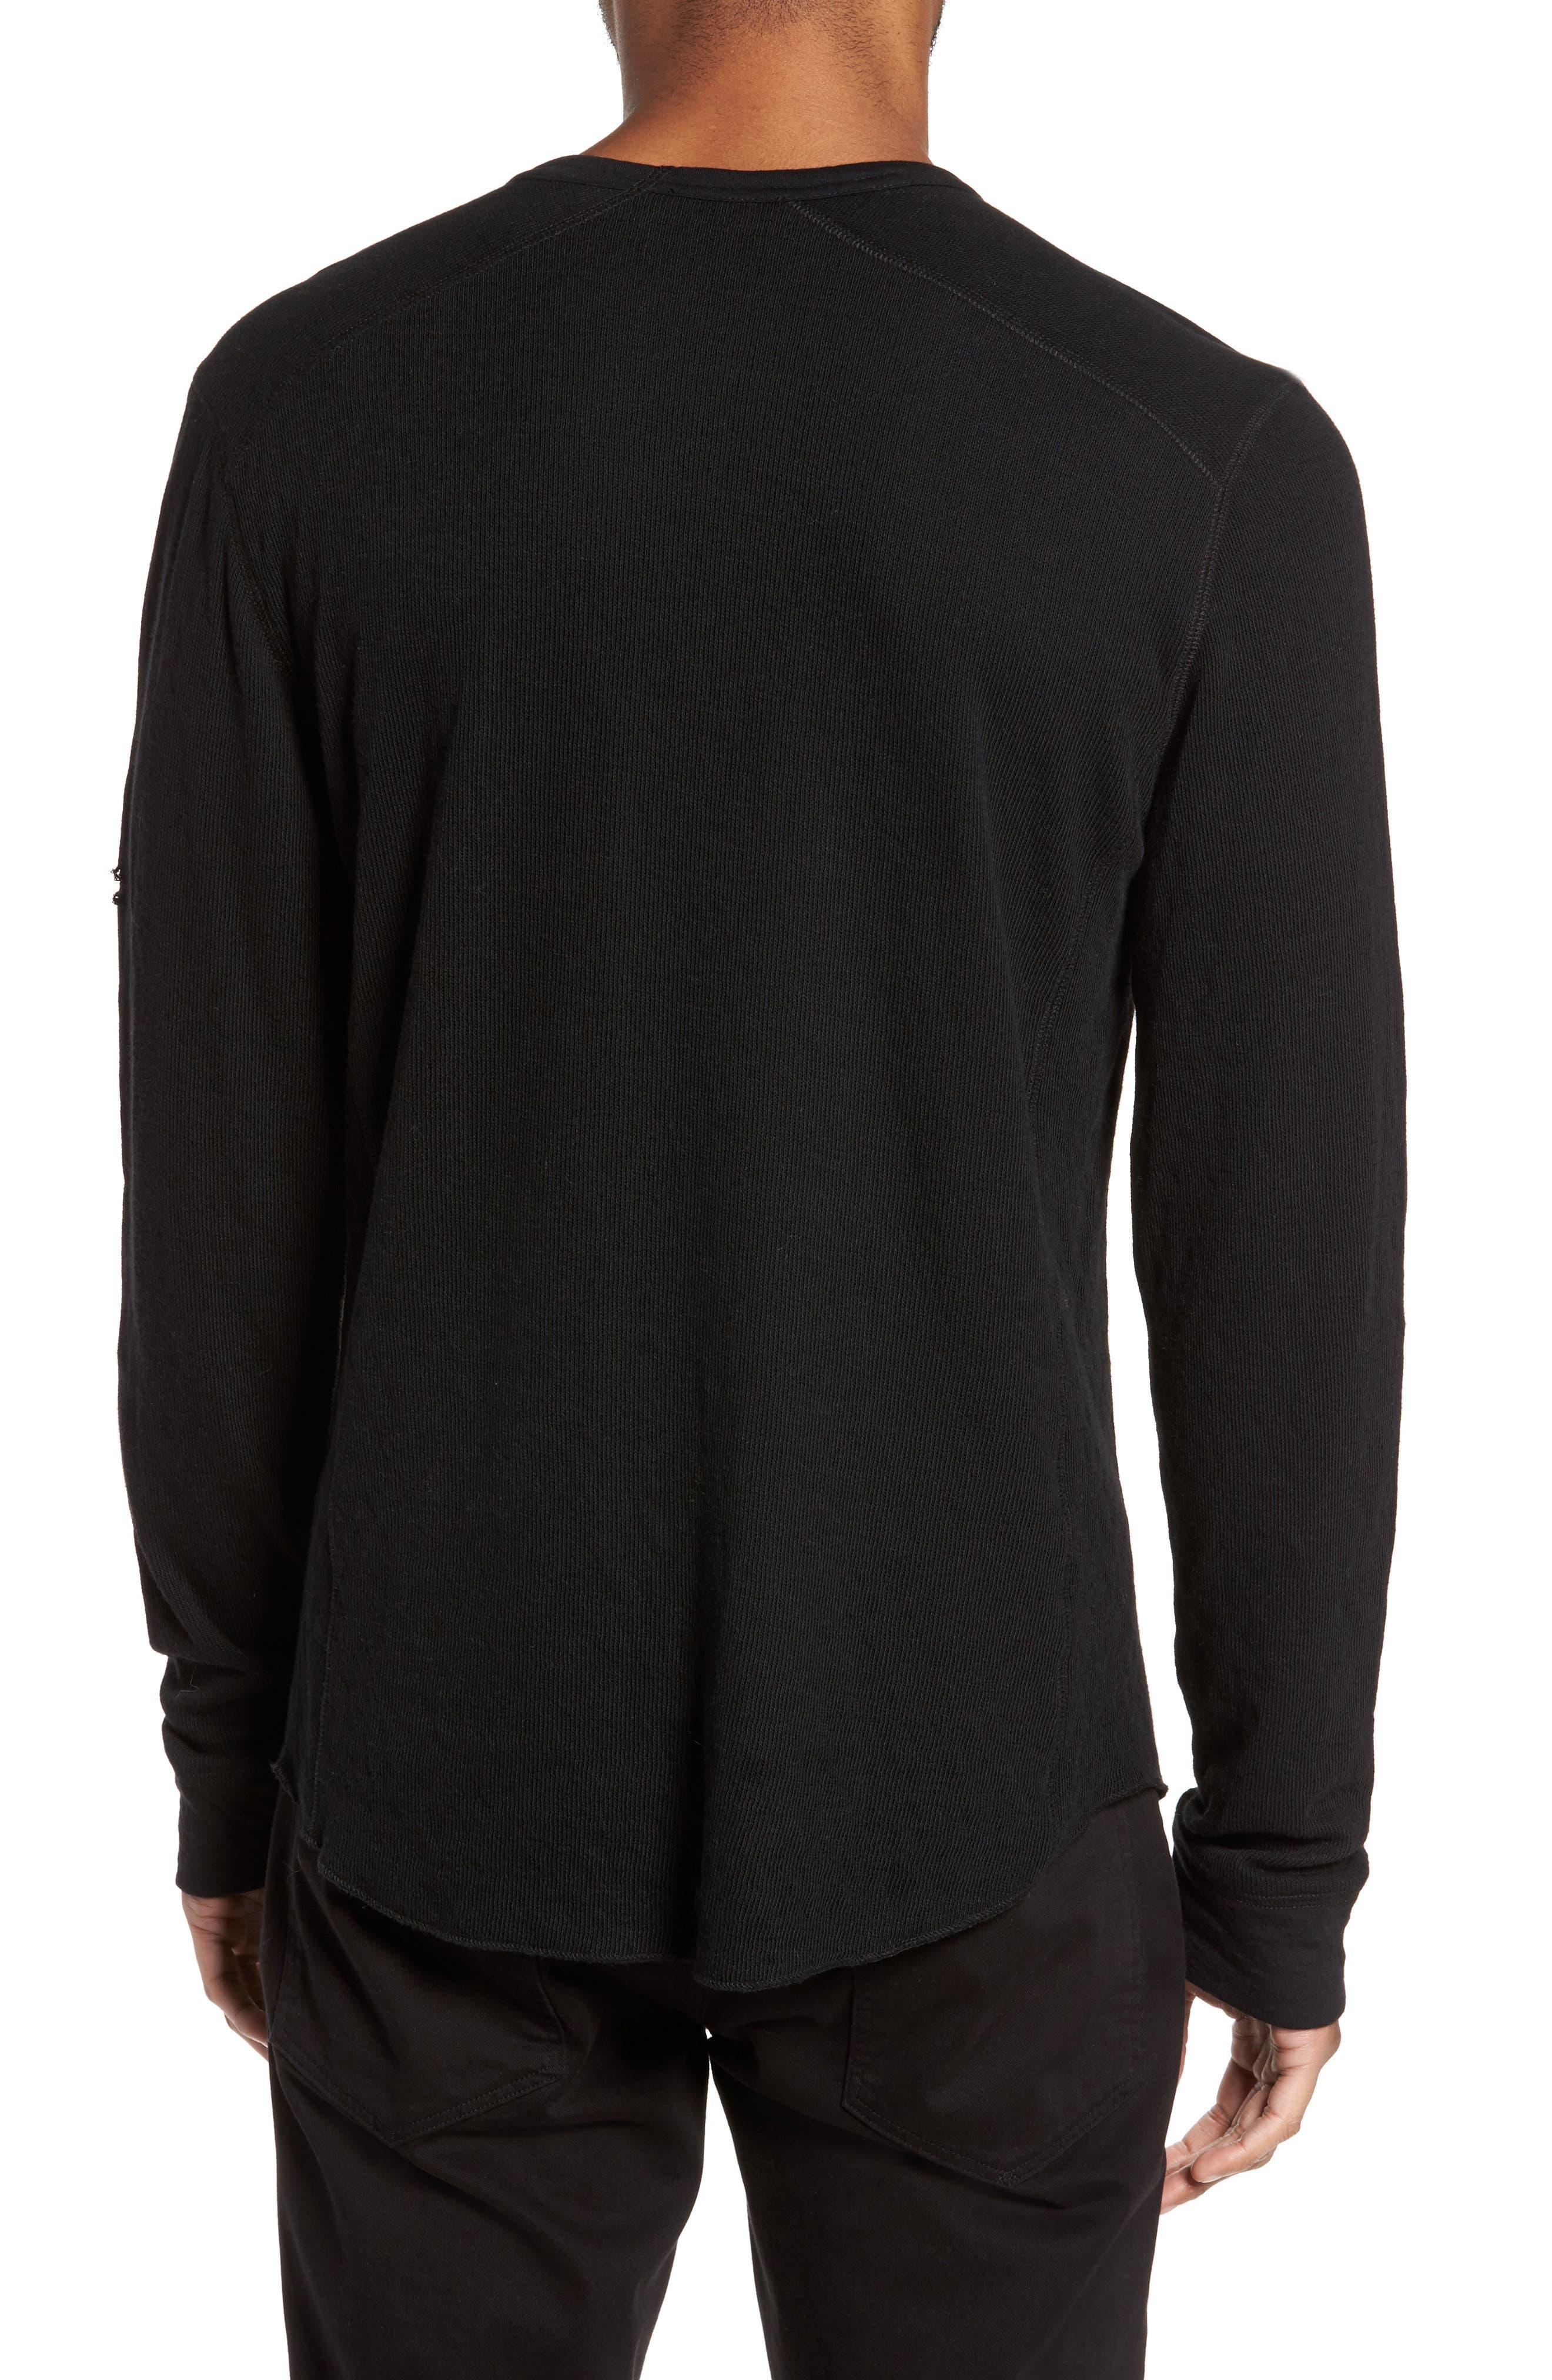 VINCE, Double Knit Long Sleeve T-Shirt, Alternate thumbnail 2, color, BLACK